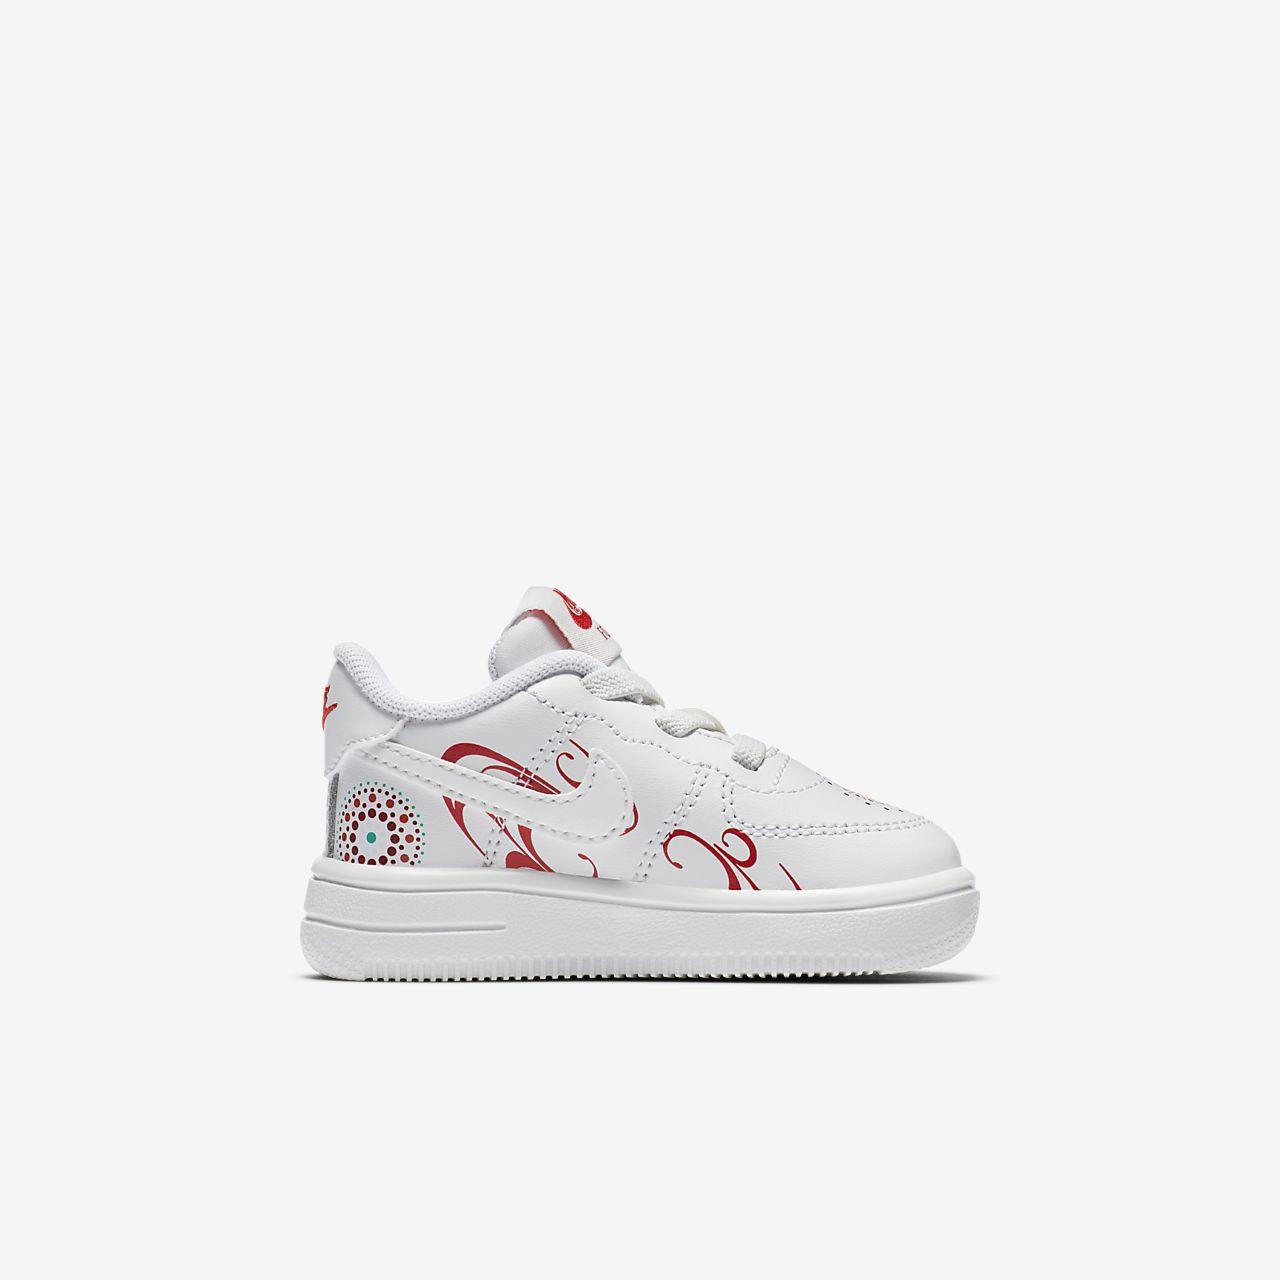 ... Nike Air Force 1 Pinnacle QS Infant/Toddler Shoe